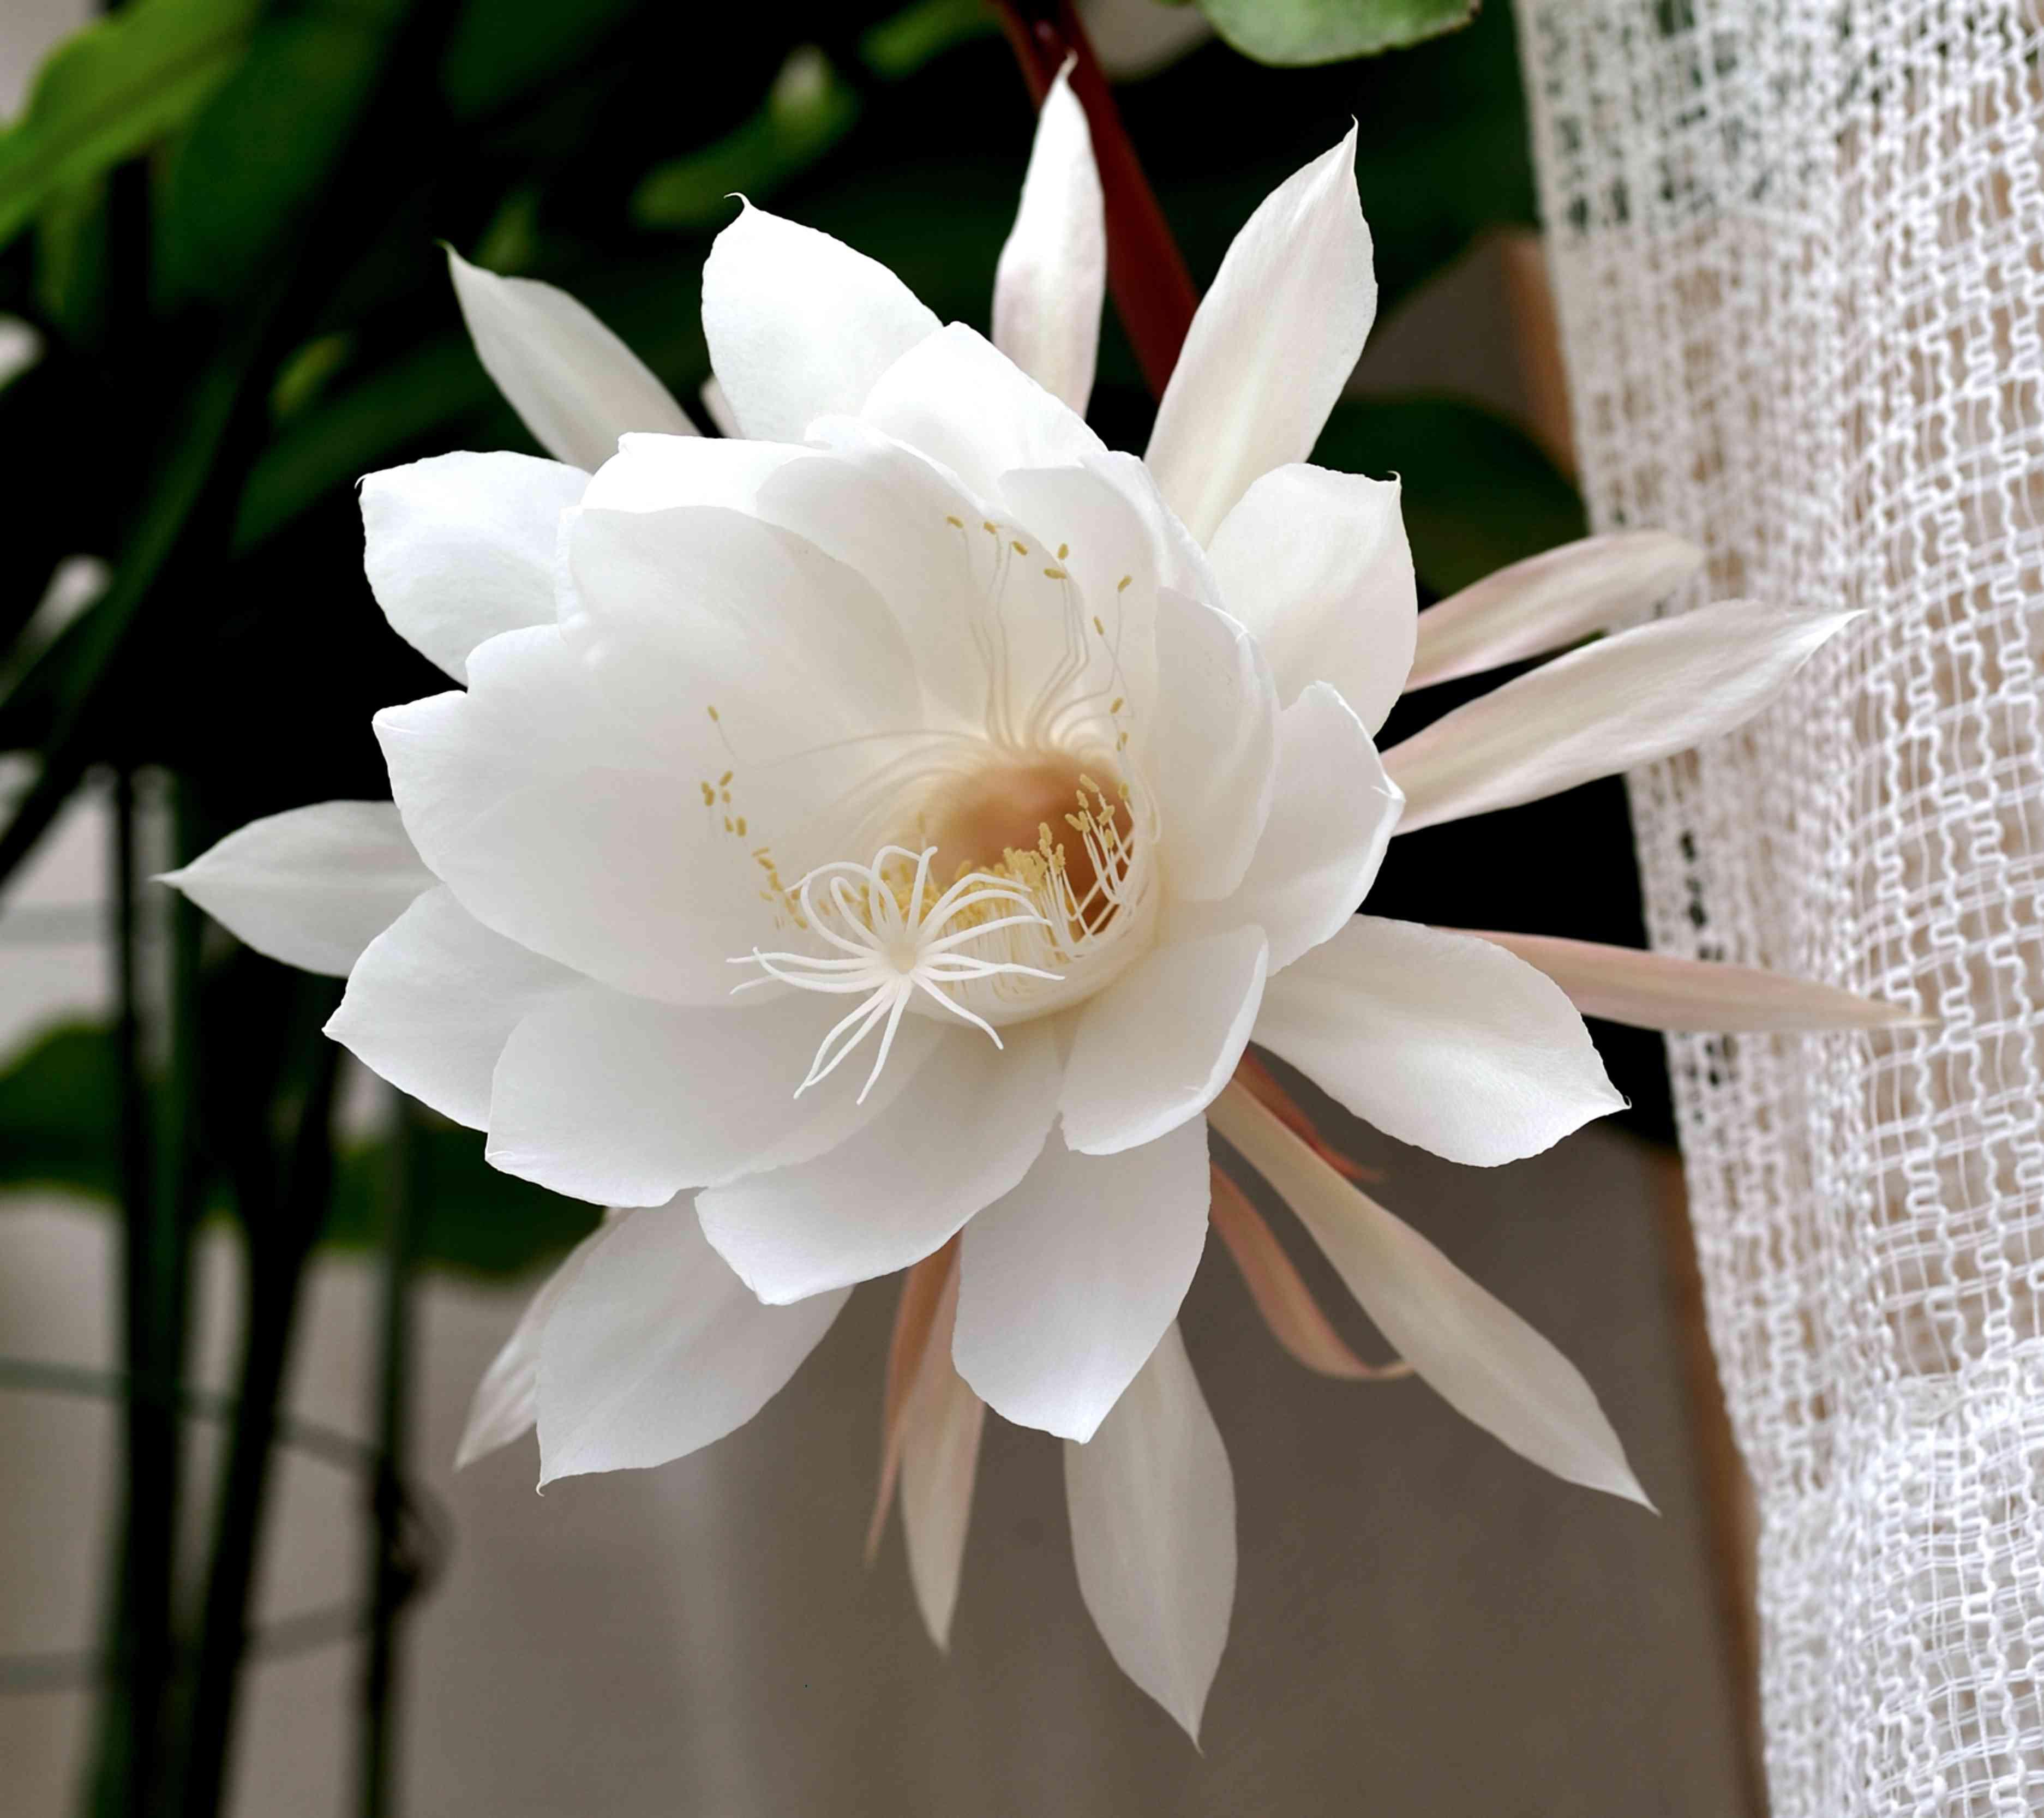 Flower of Epiphyllum oxypetalum.